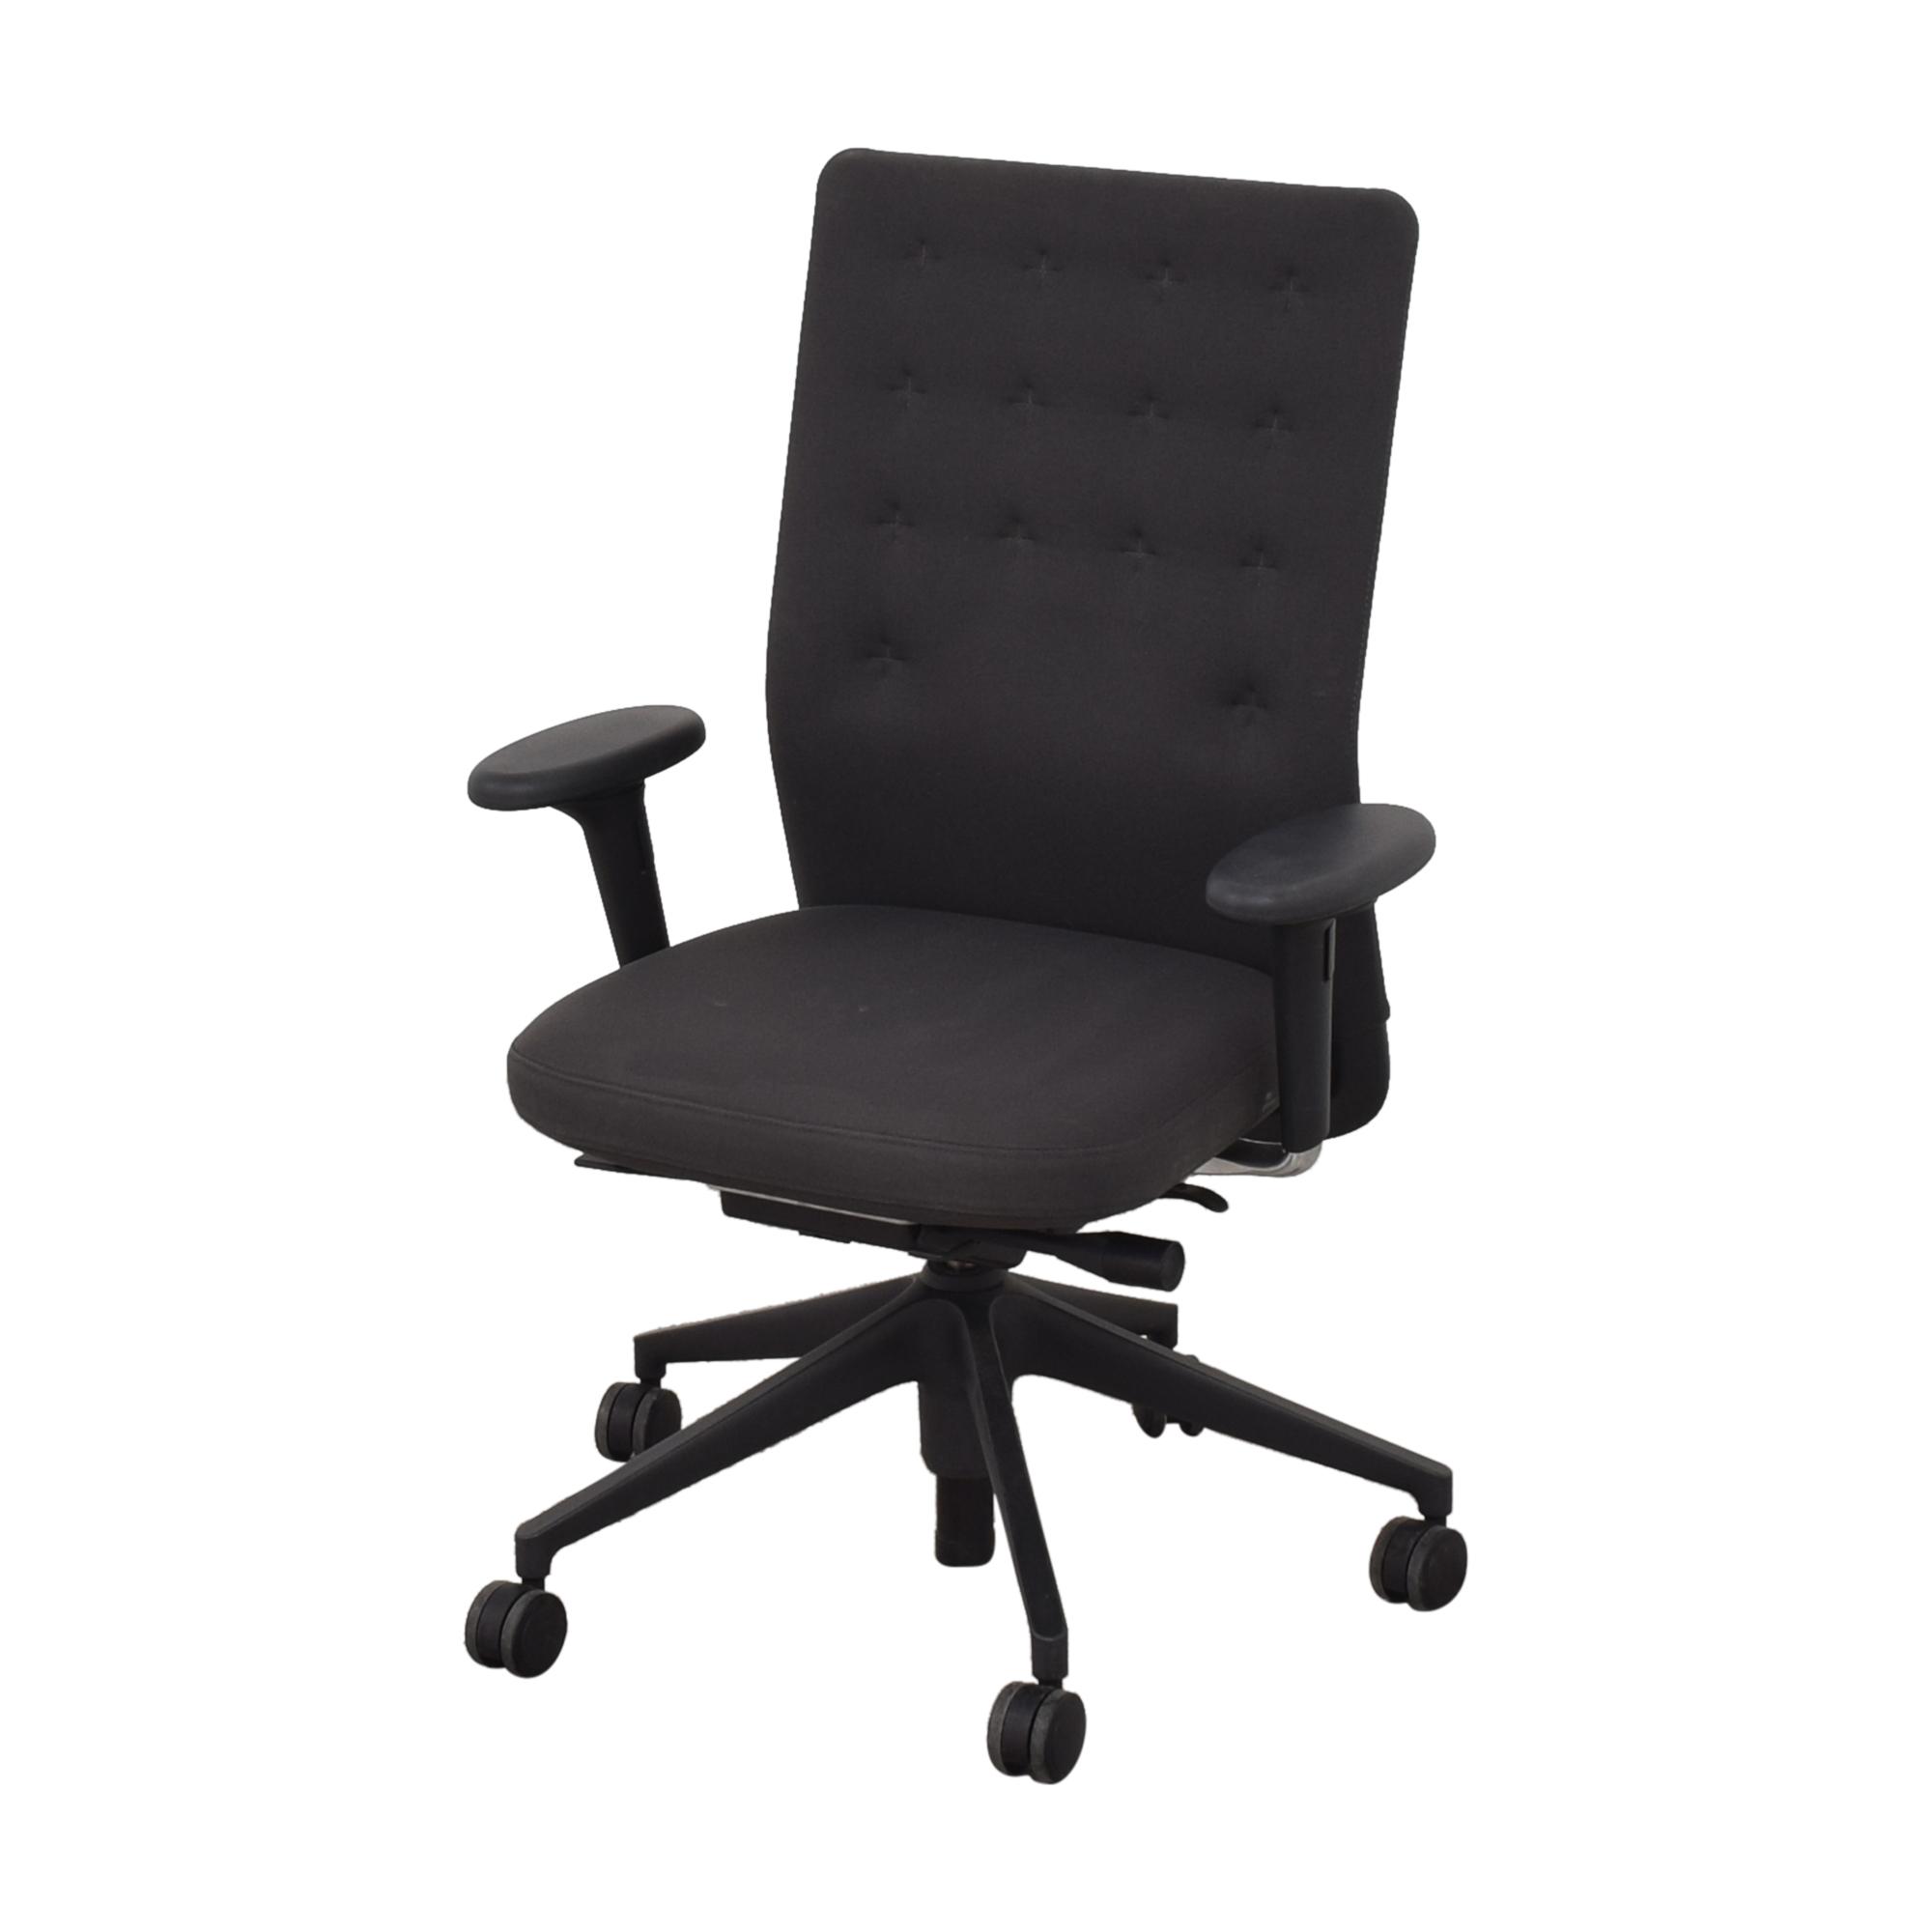 Vitra Vitra ID Trim Office Chair Chairs